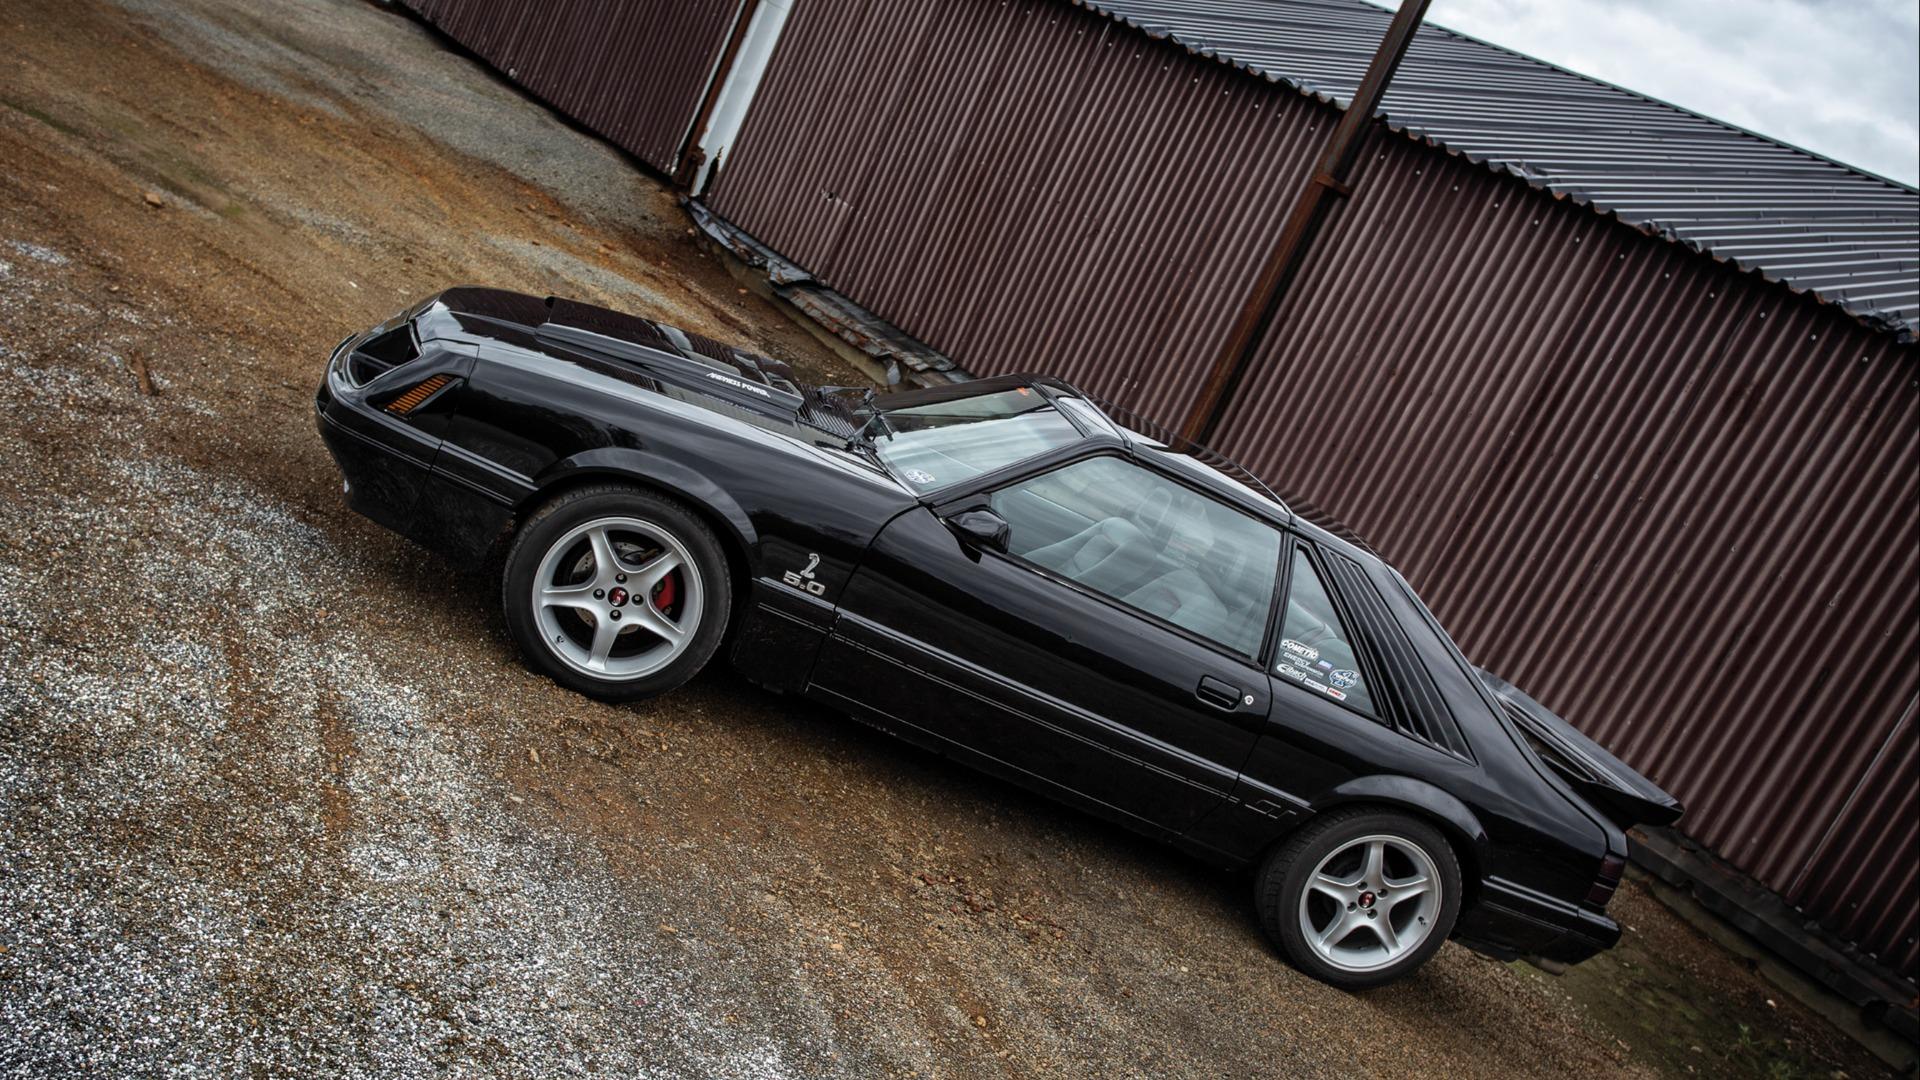 Mustang sin Fox body har helt særegne linjer